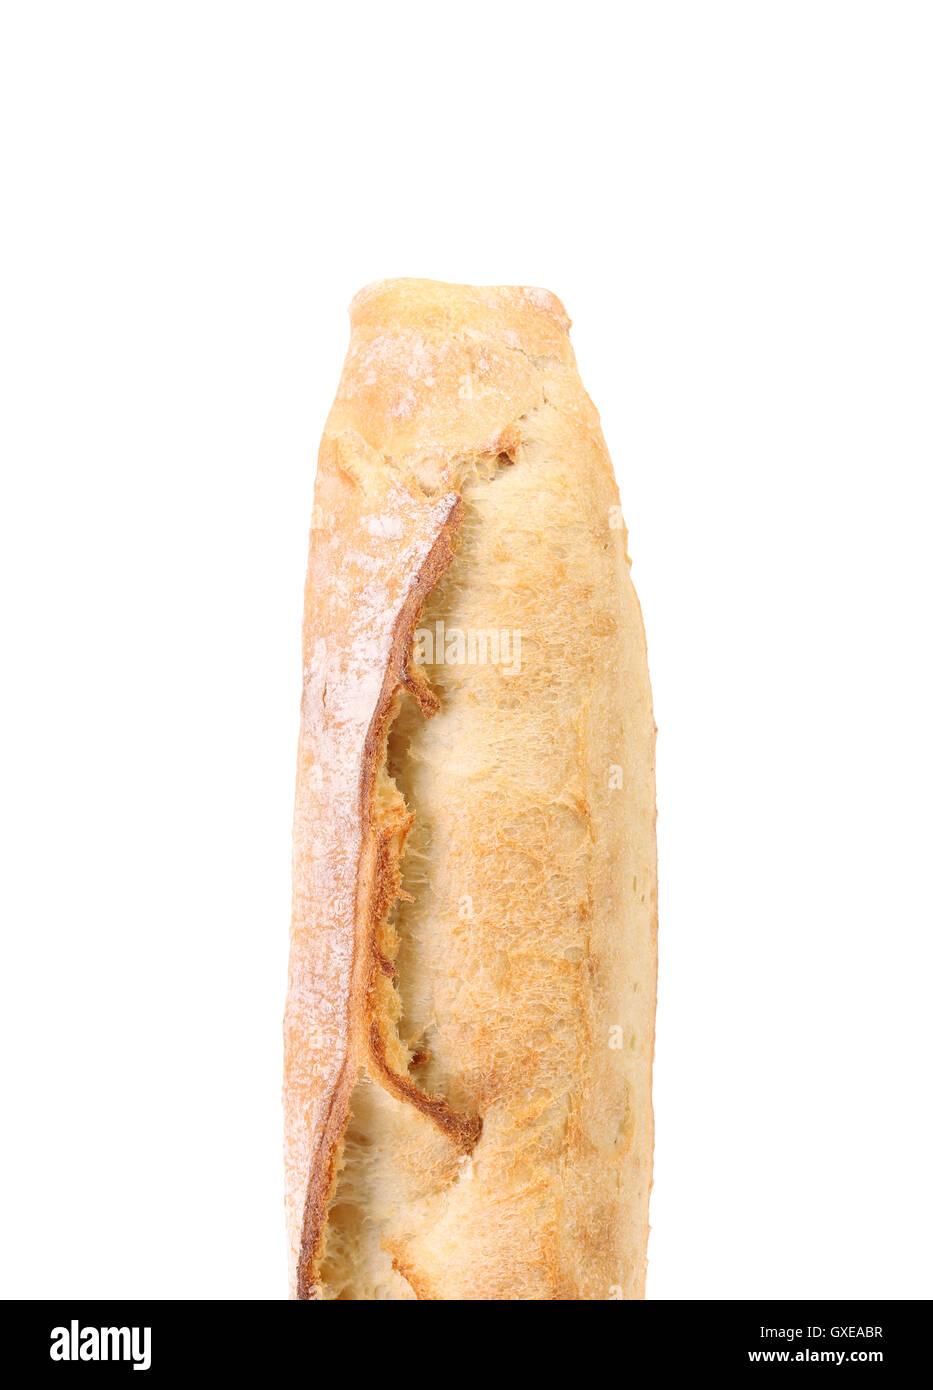 Crackling bread. - Stock Image